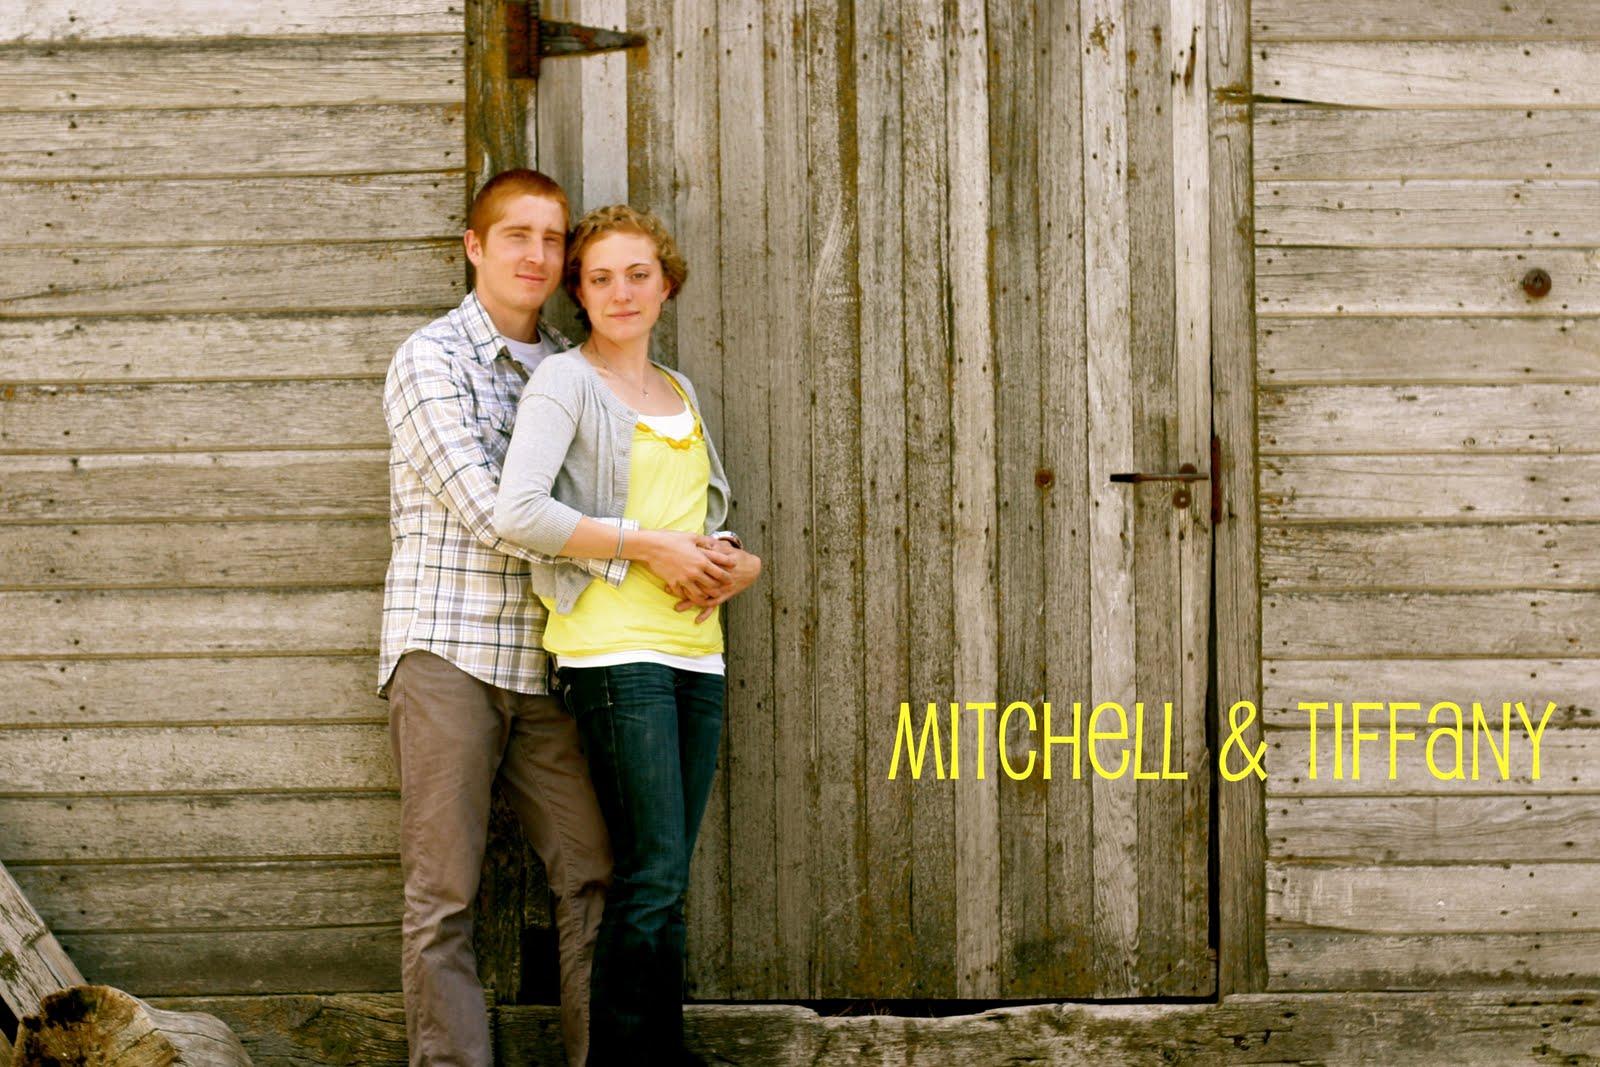 Mitchell and Tiffany Elias